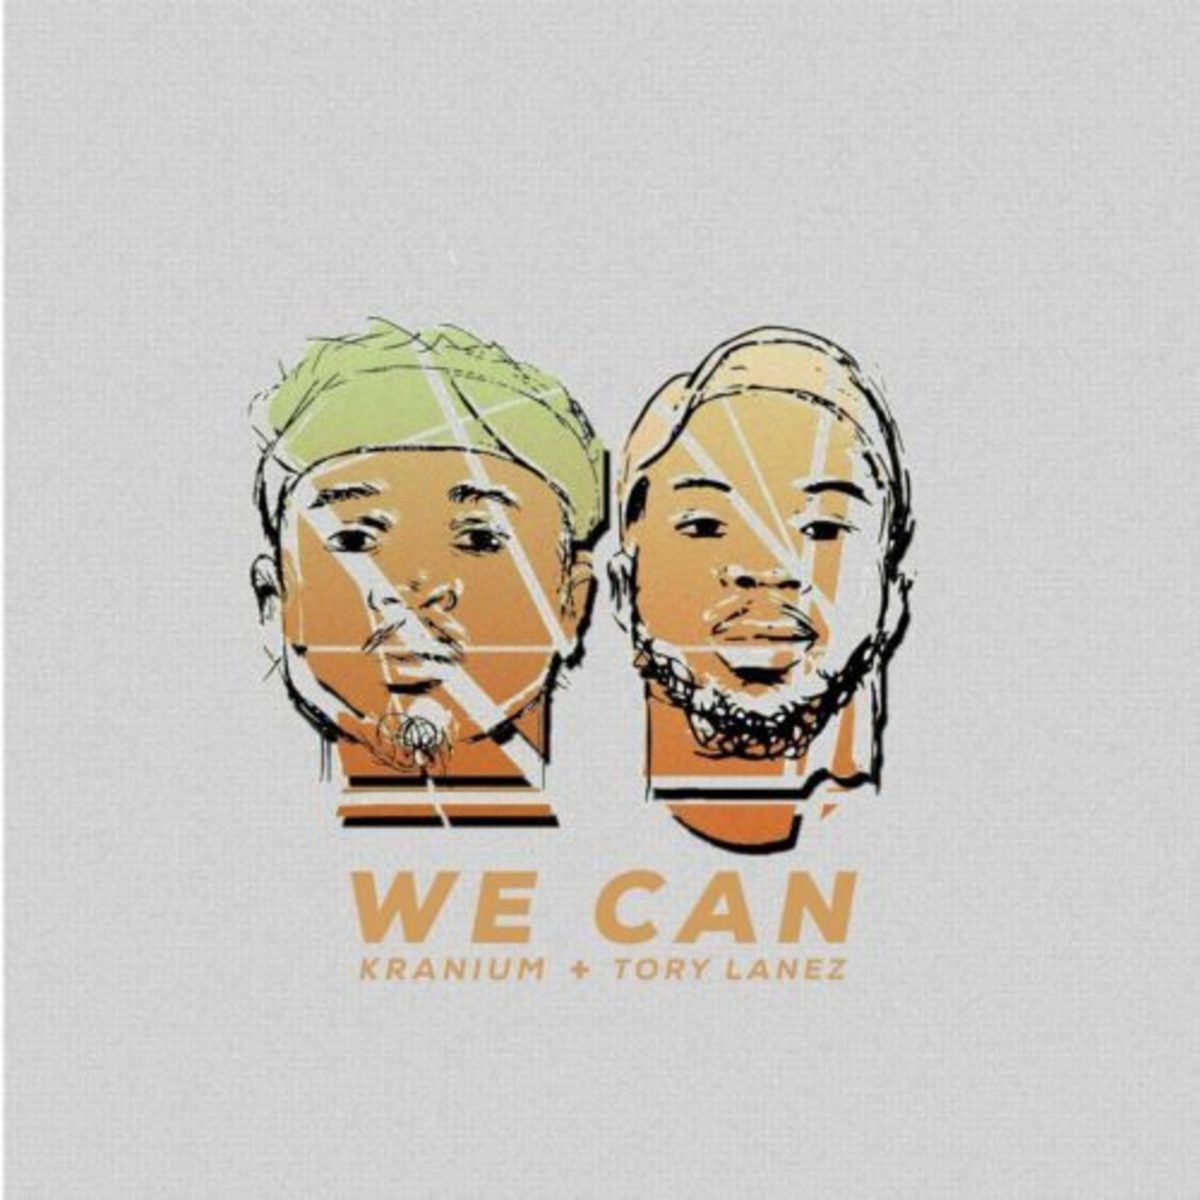 kranium-we-can.jpg